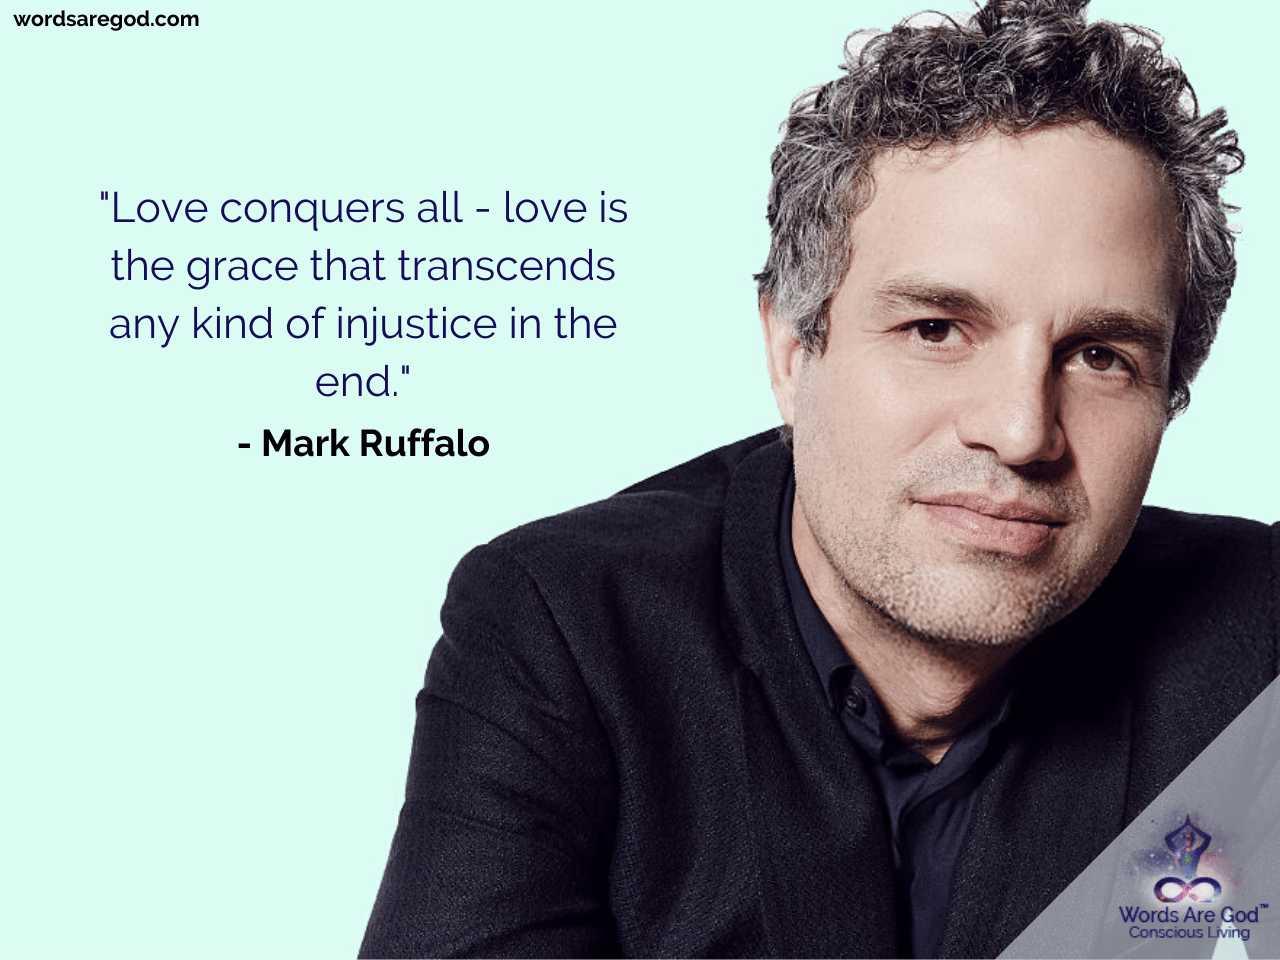 Mark Ruffalo Inspirational Quotes by Mark Ruffalo